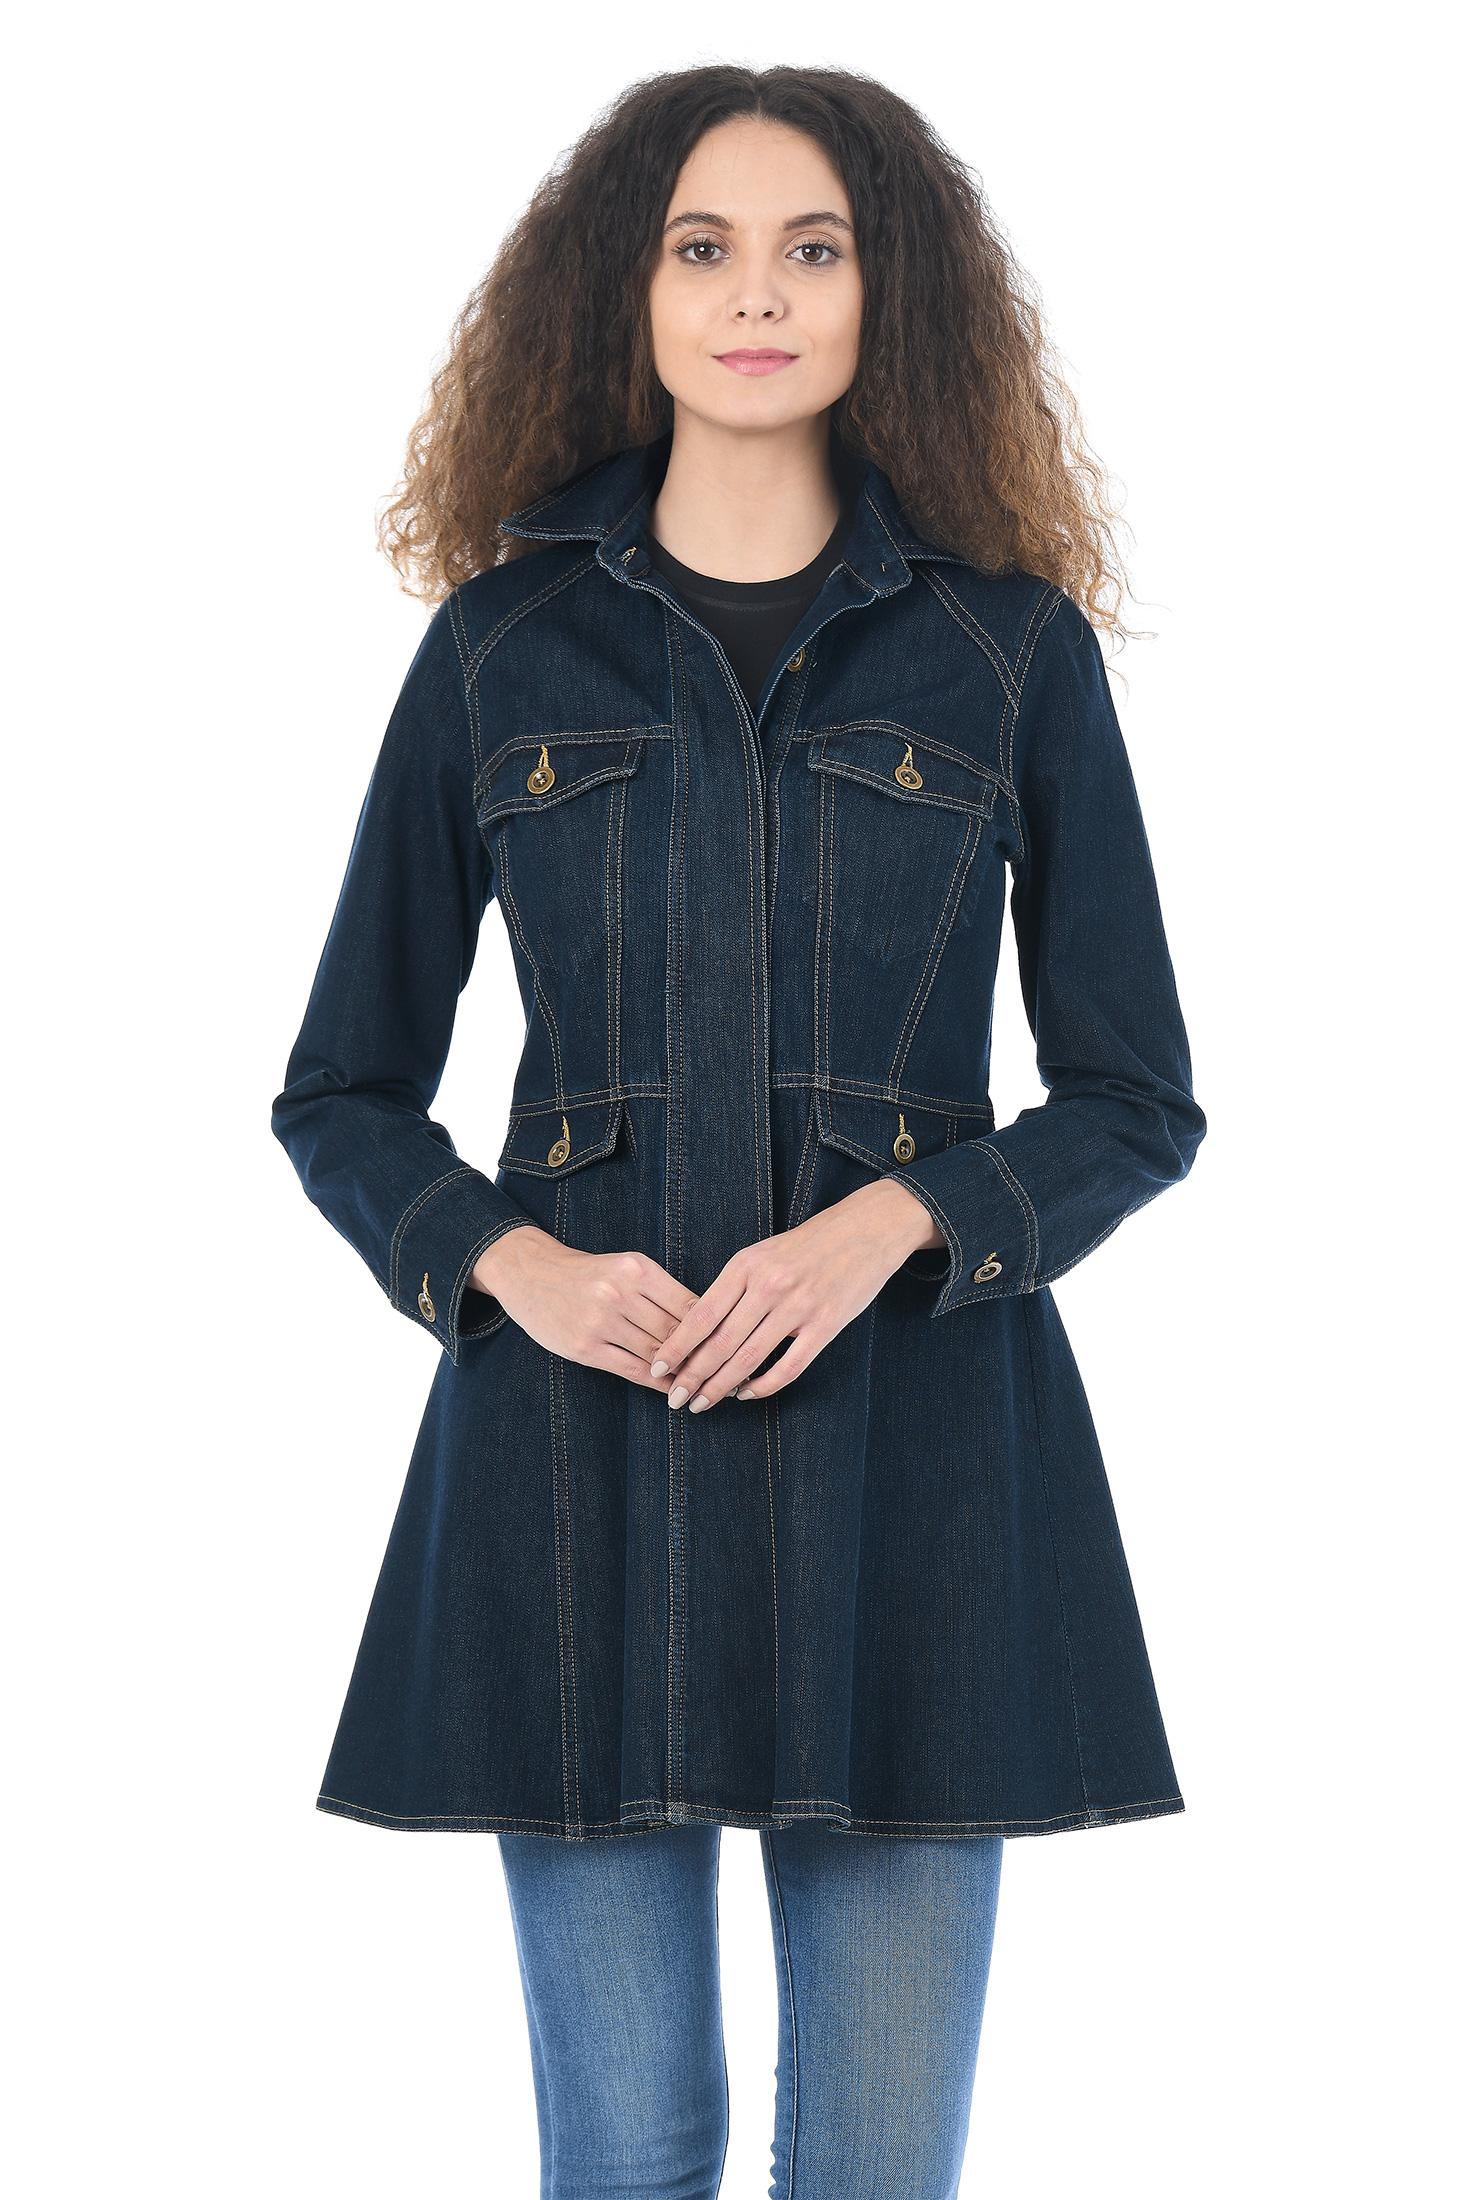 eShakti Women's Deep indigo denim peplum jacket CL0053524